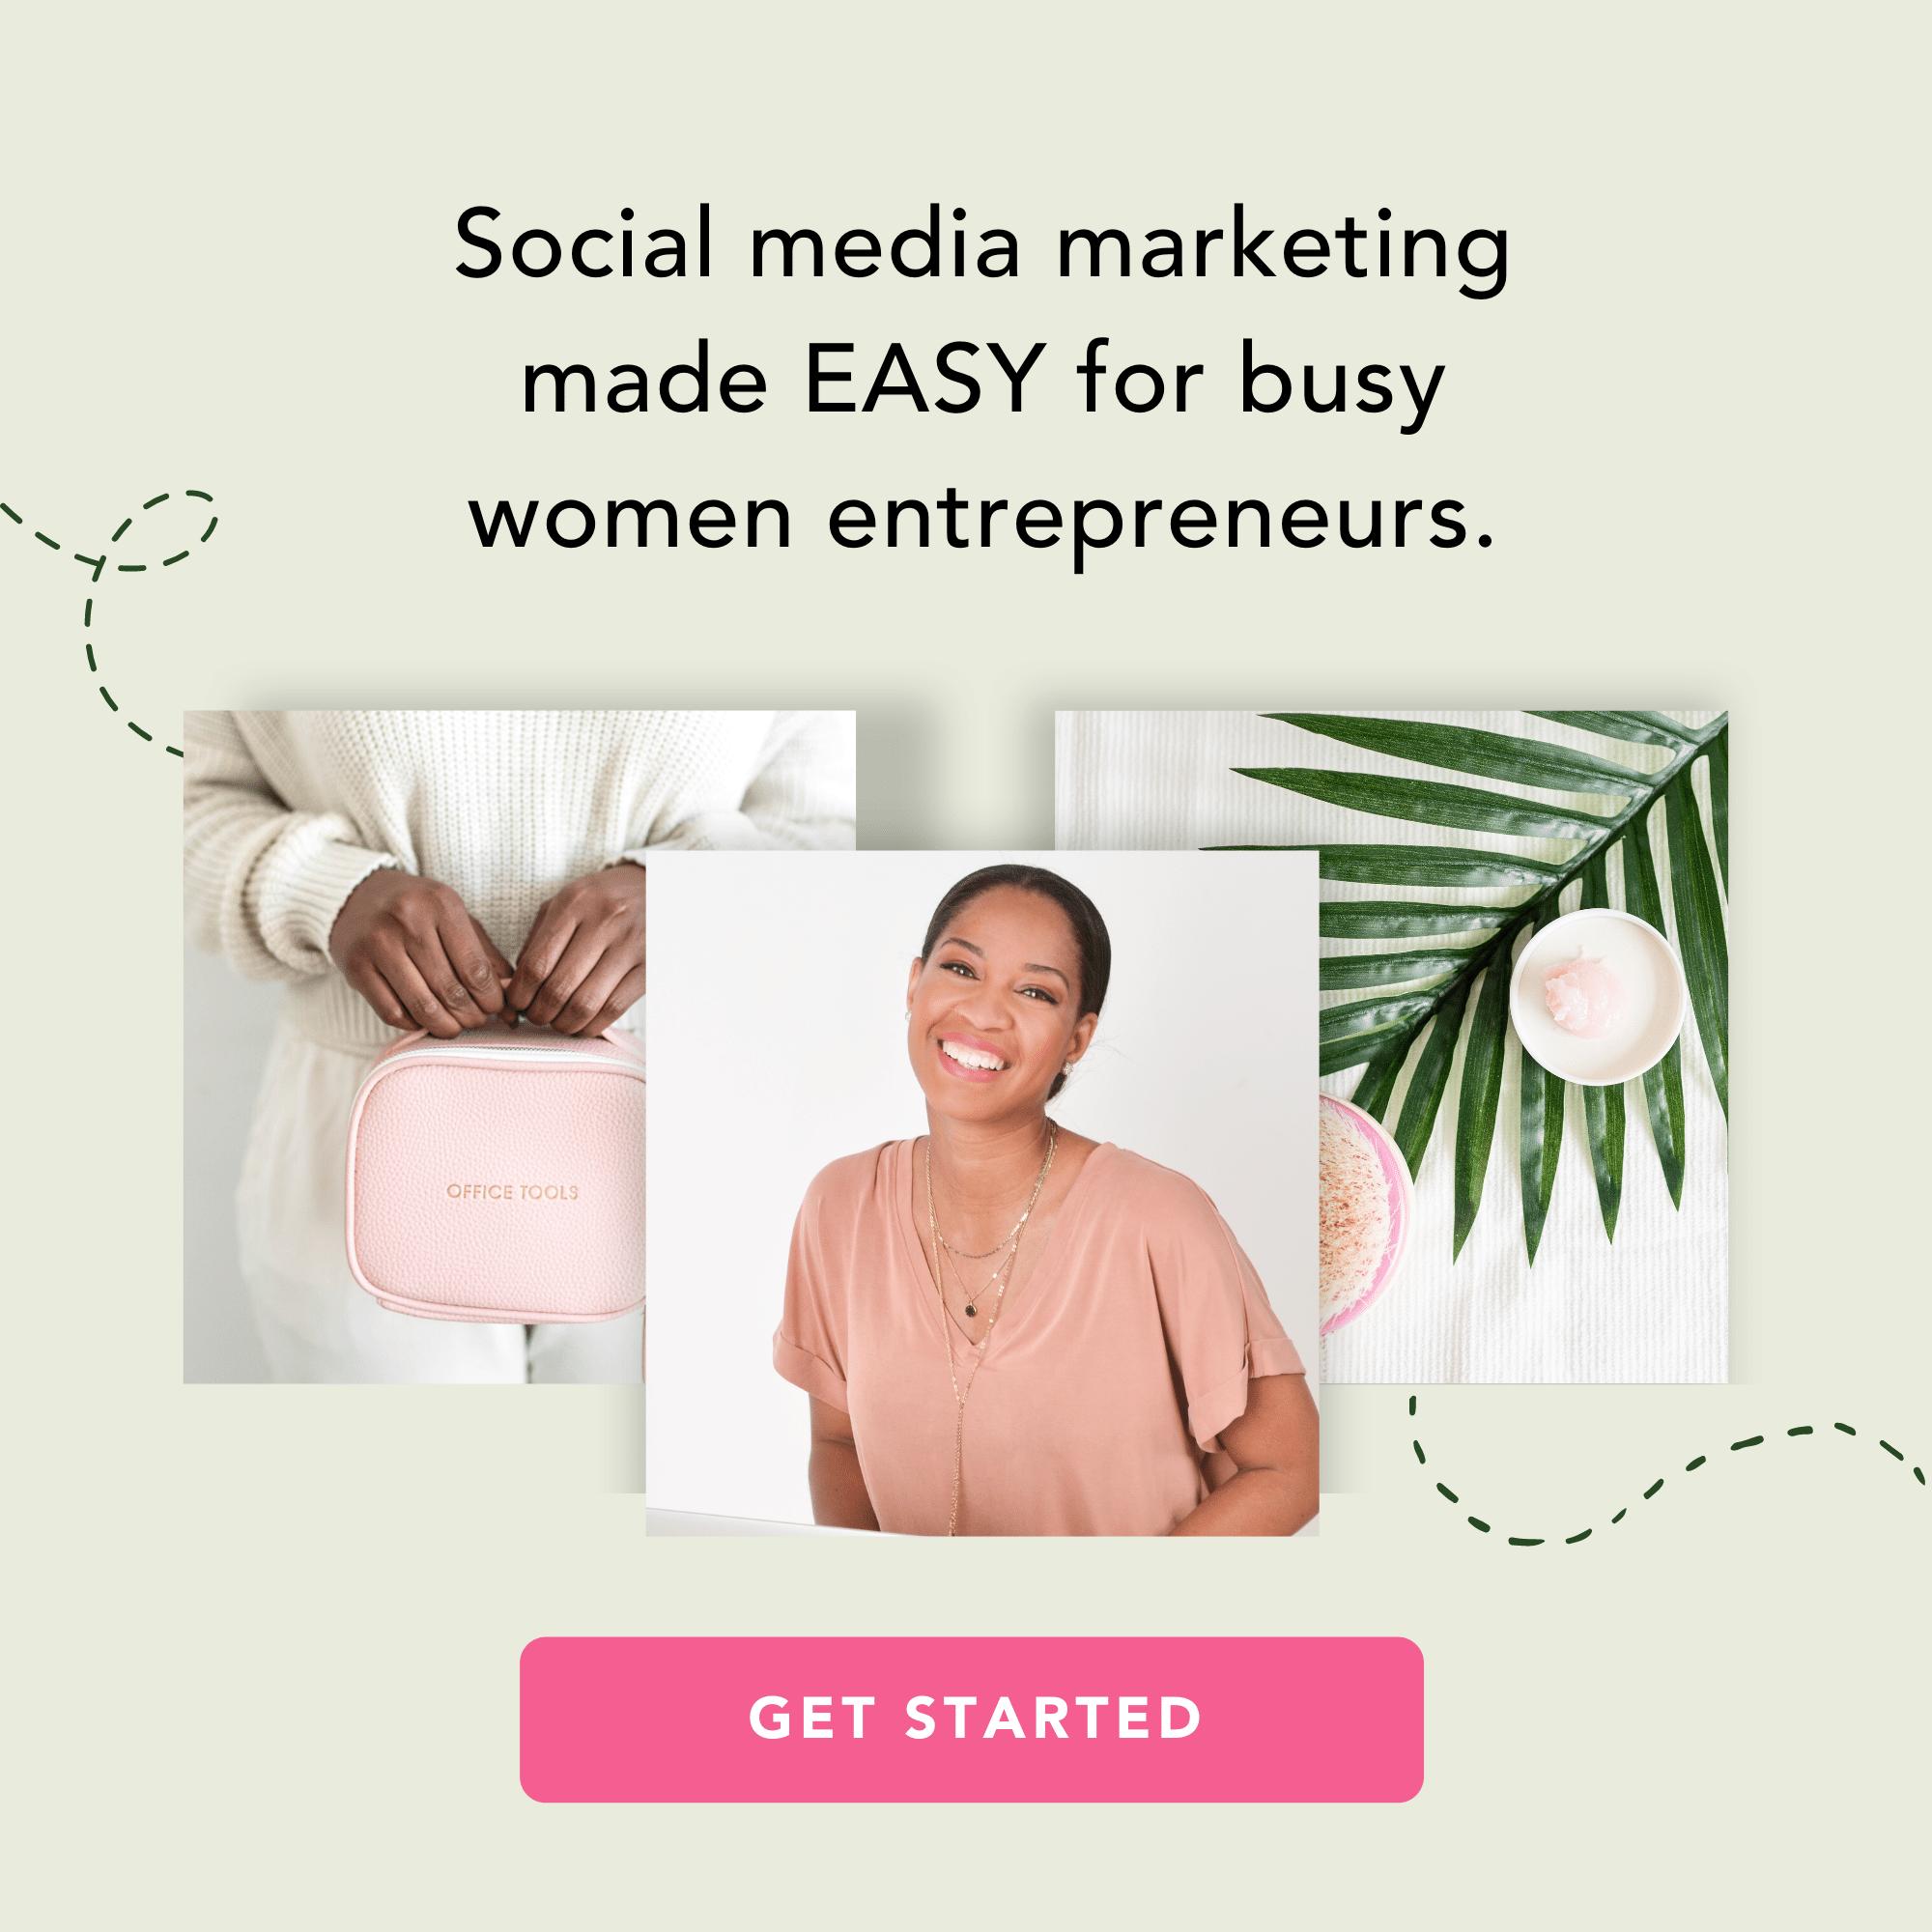 Social Media Marketing for Women Entrepreneurs - Pixistock Styled Stock Photos - Canva Templates for business